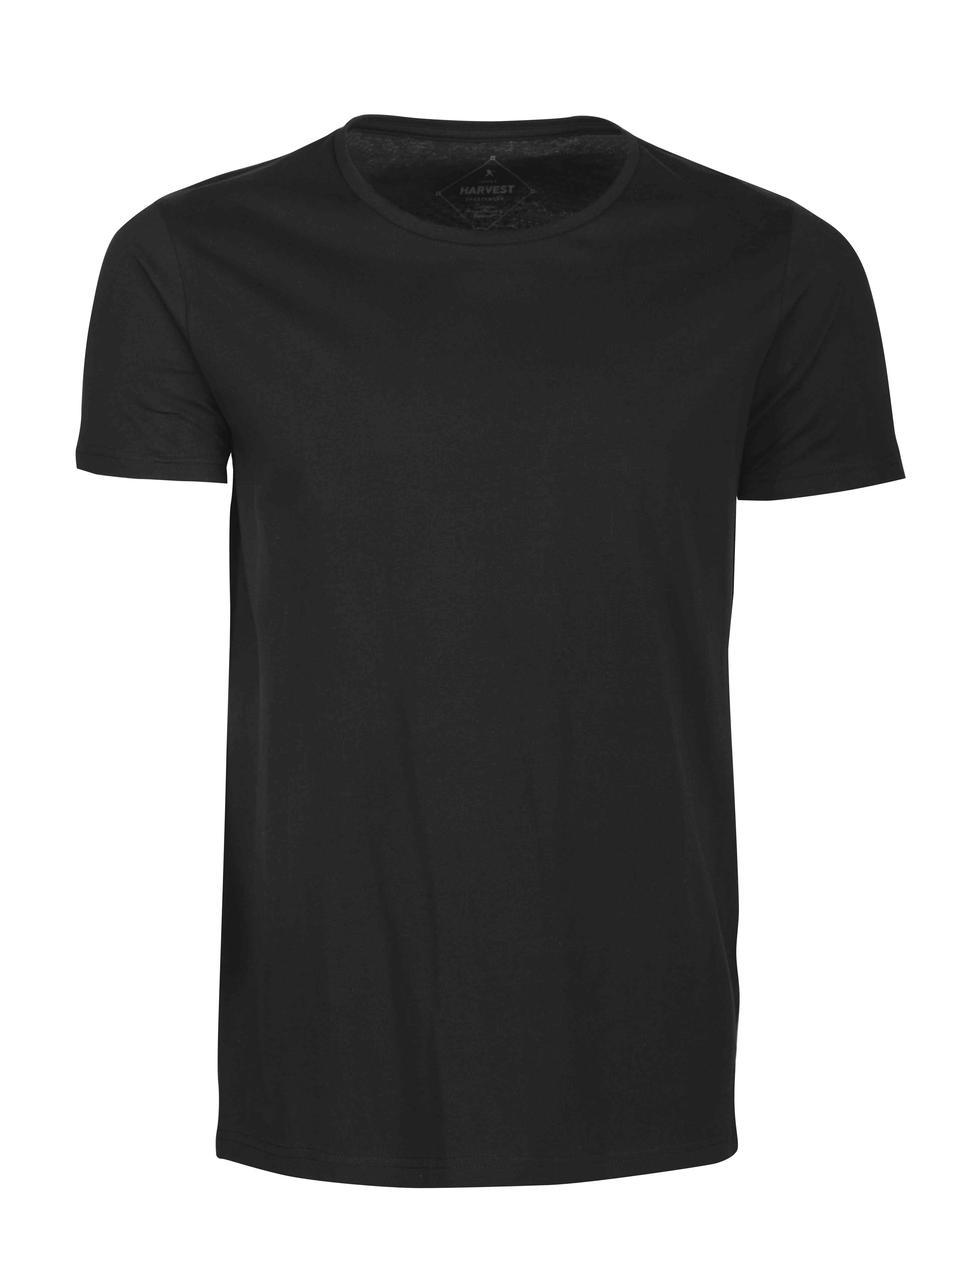 Мужская футболка Twoville от ТМ James Harvest (цвет черный)